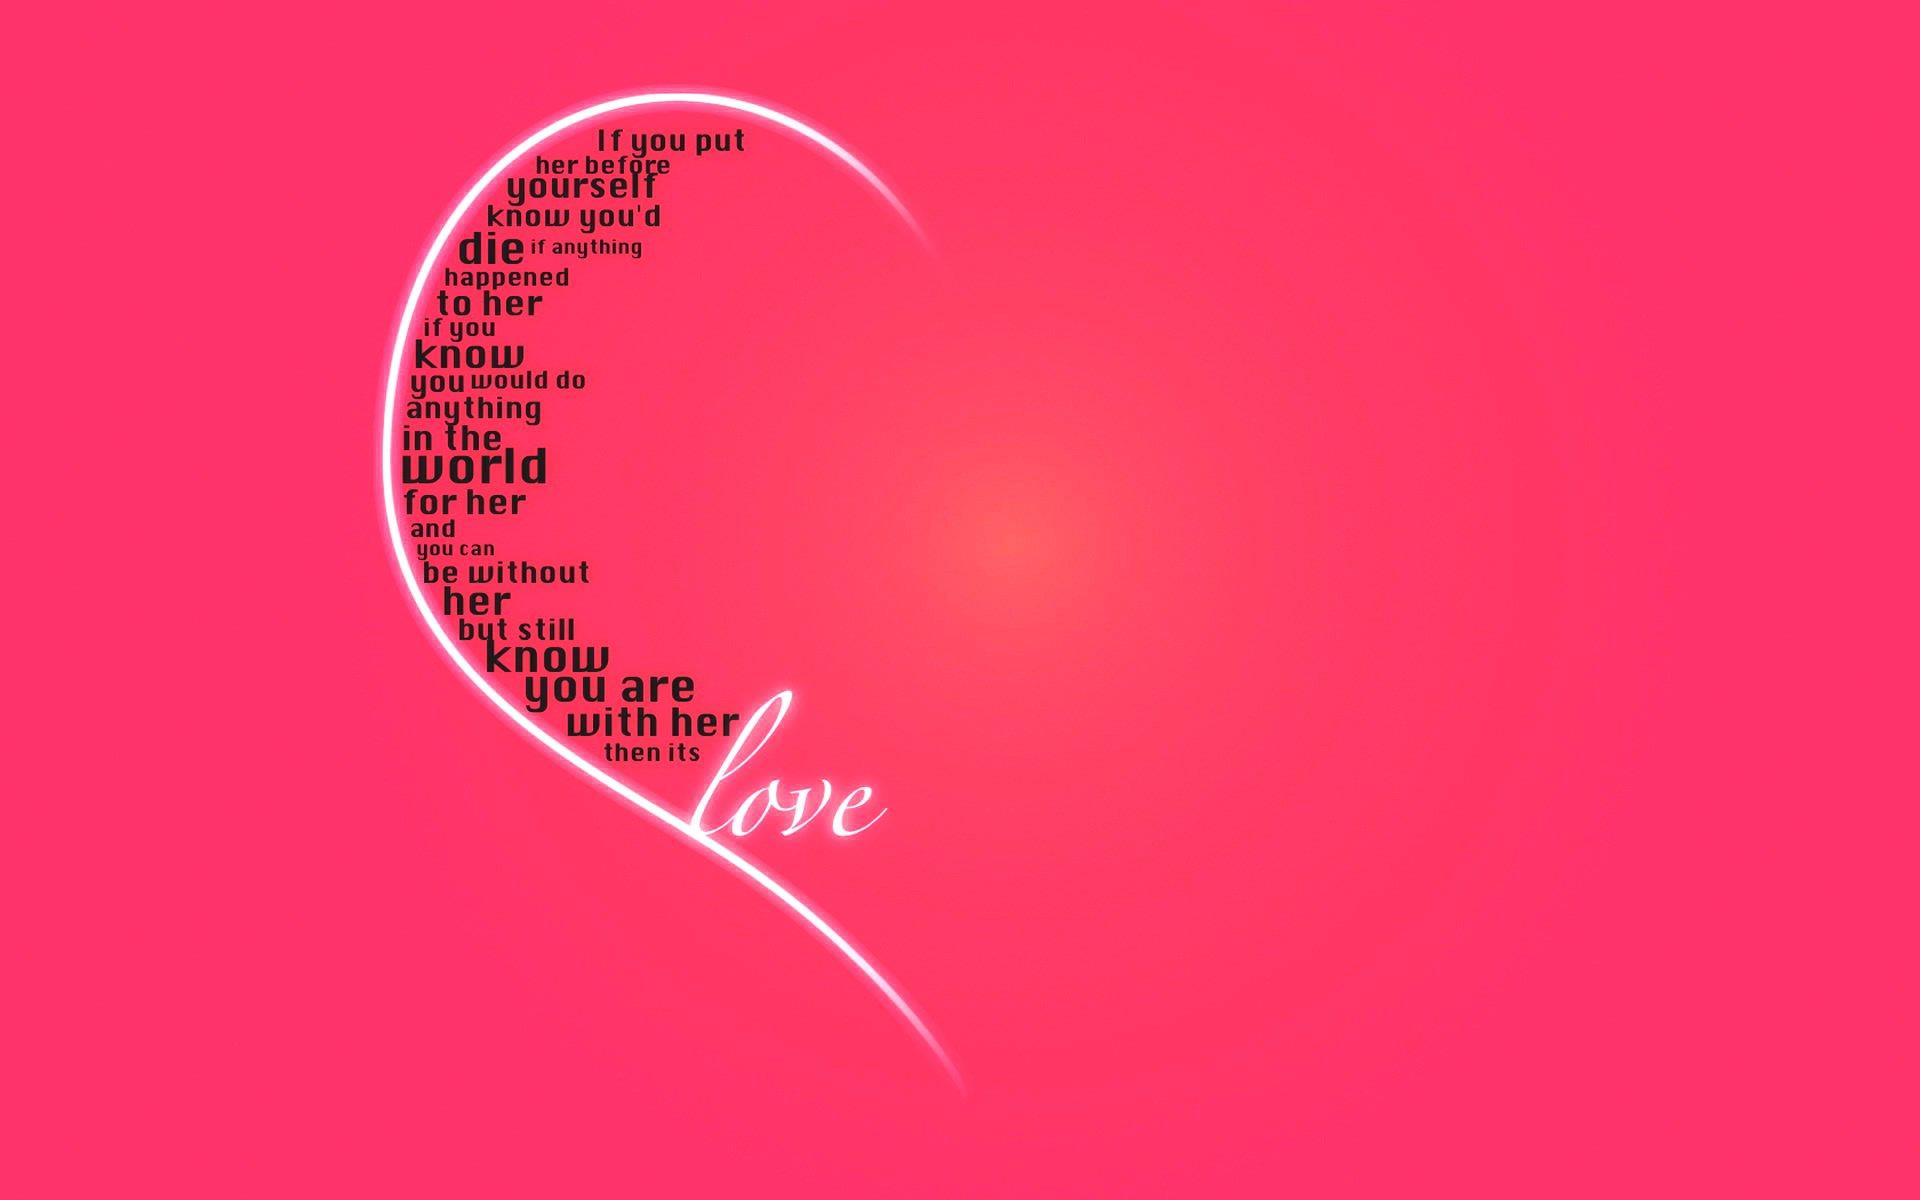 Love Quotes Desktop Backgrounds QuotesGram 1920x1200